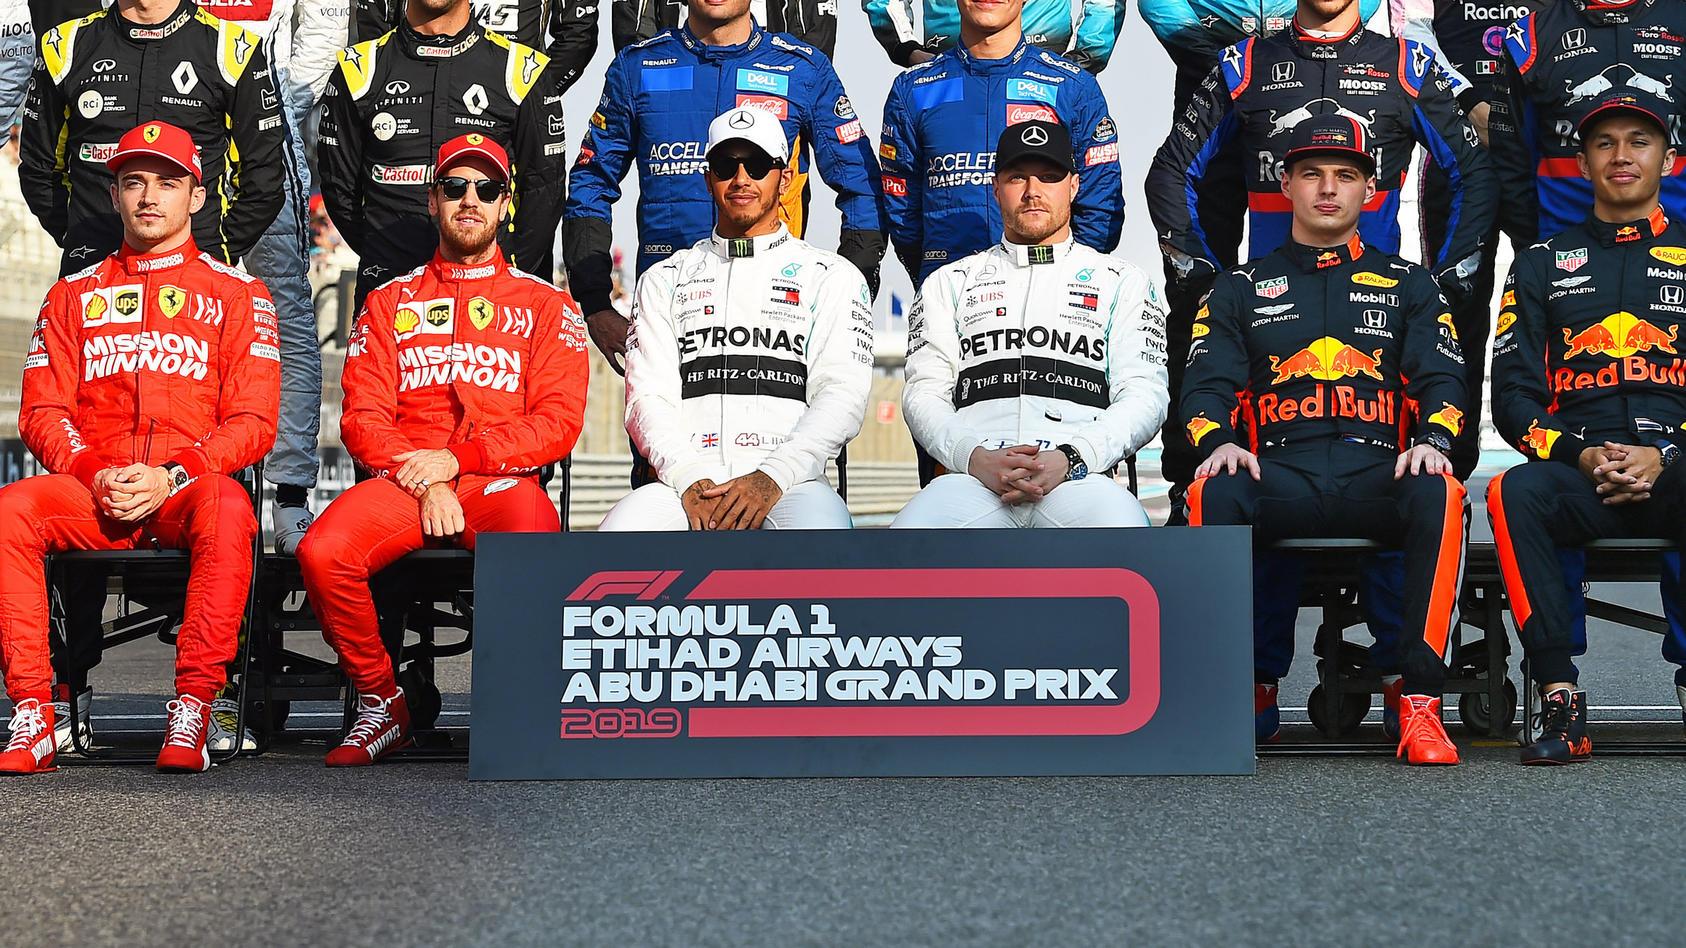 Formel 1 Fahrer Alter